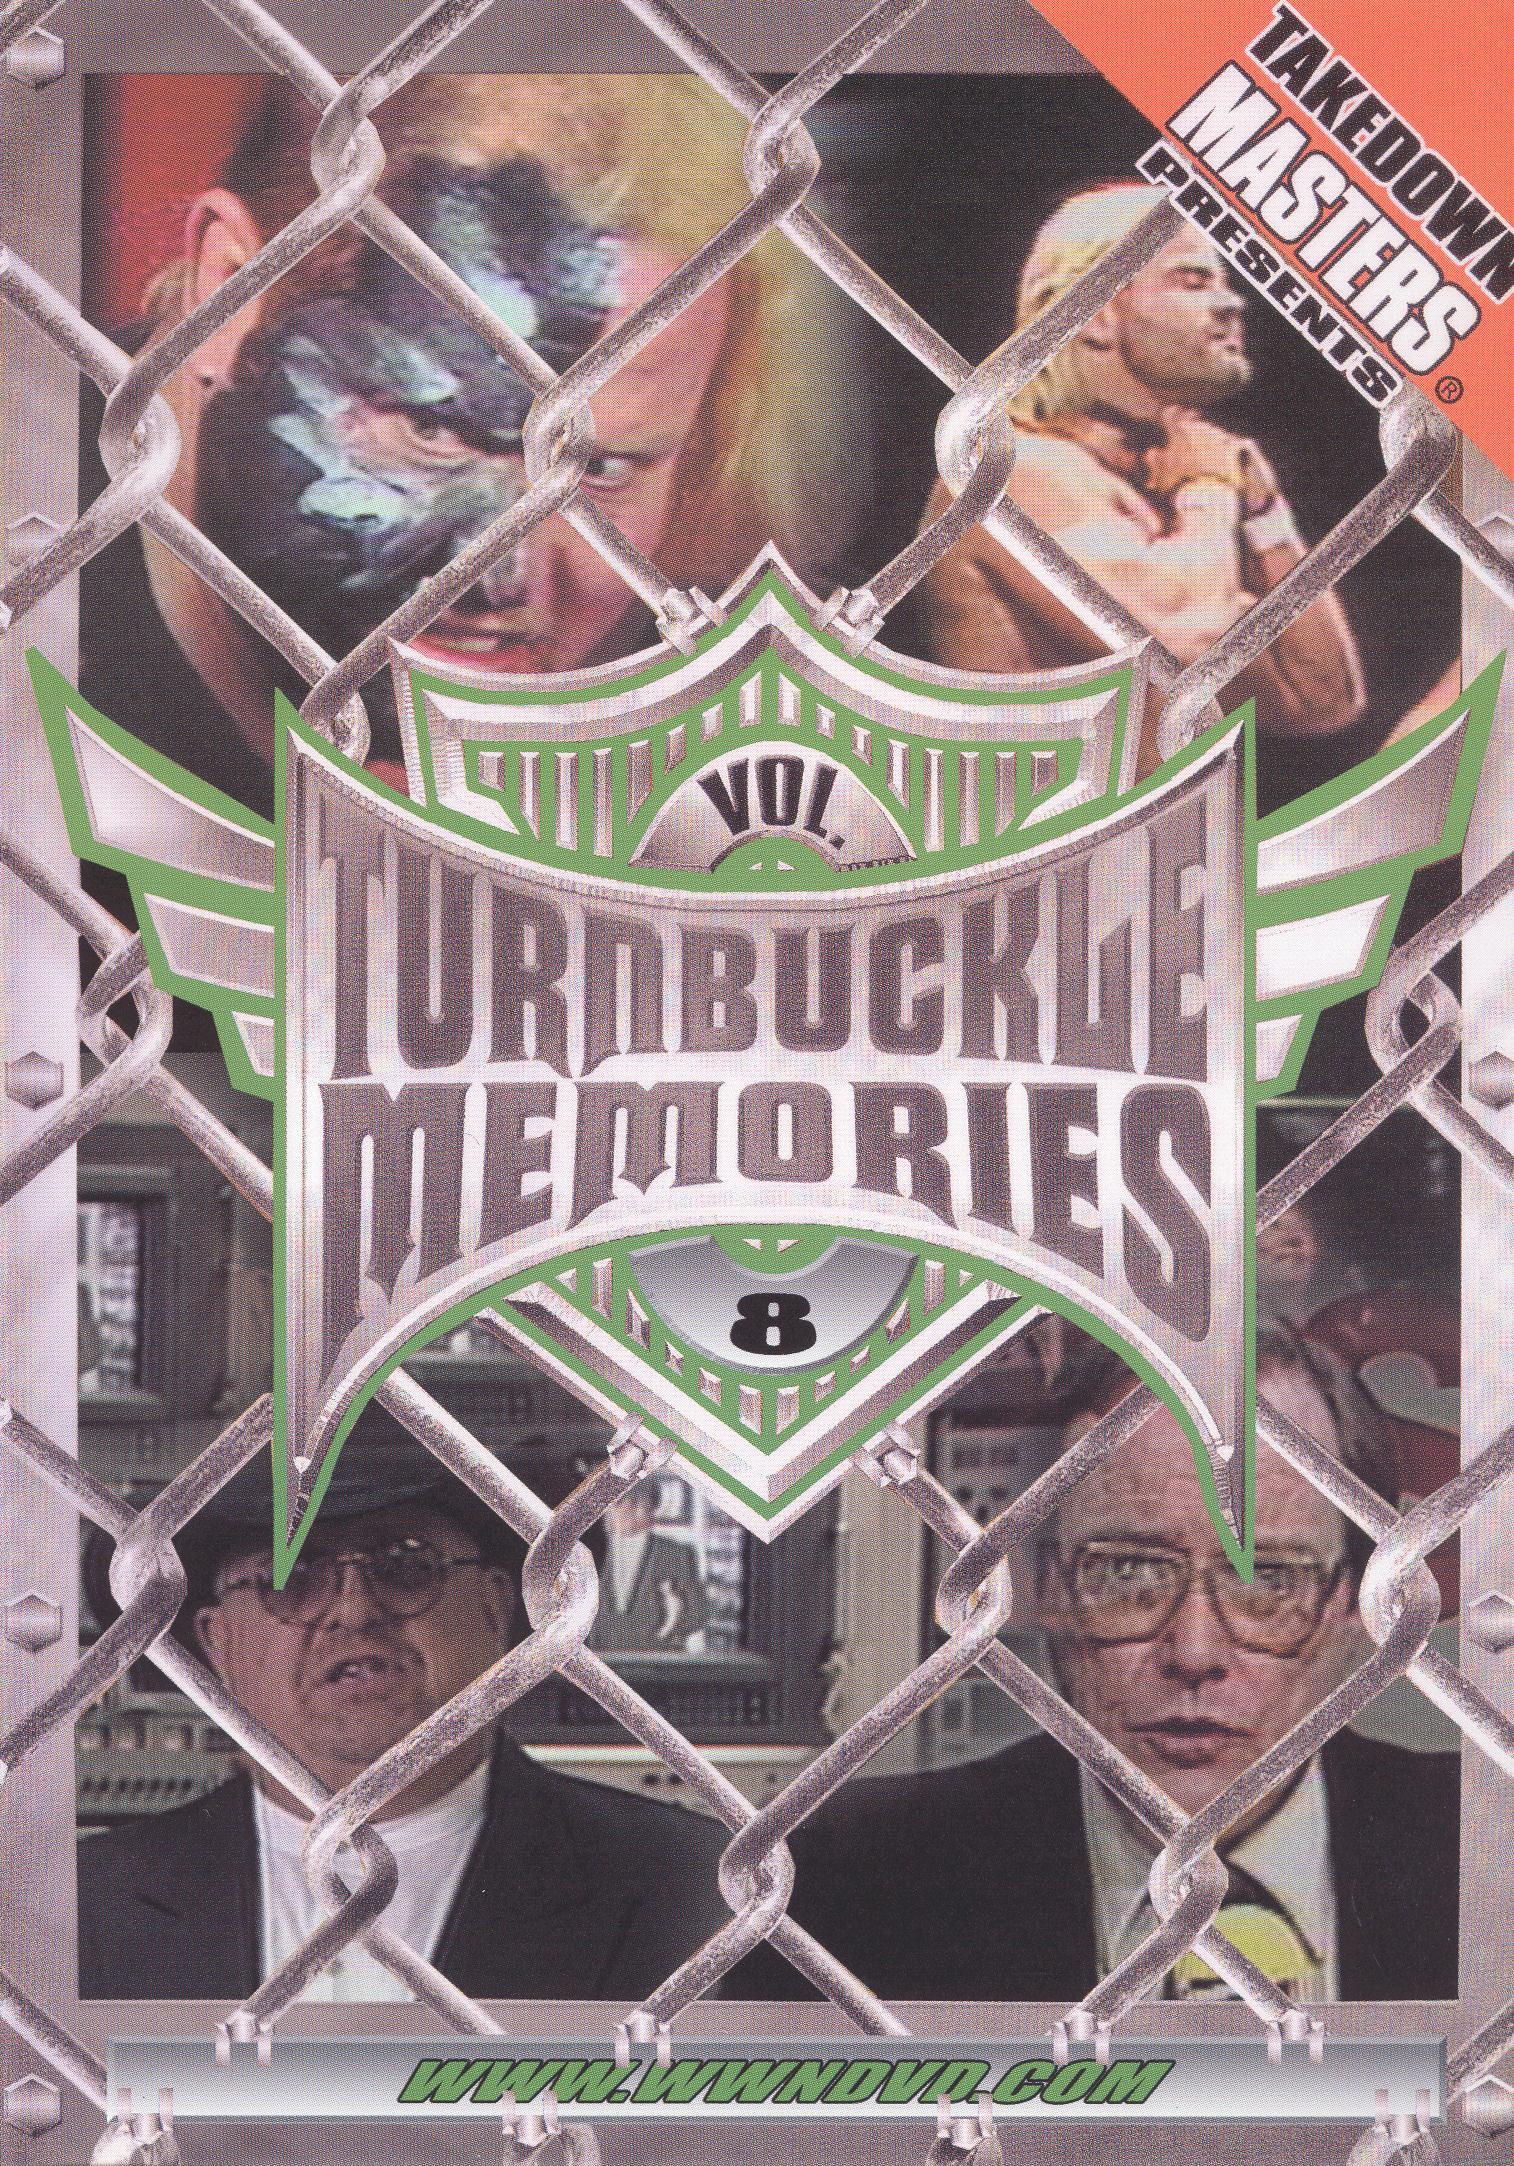 Takedown Masters: Turnbuckle Memories, Vol. 8